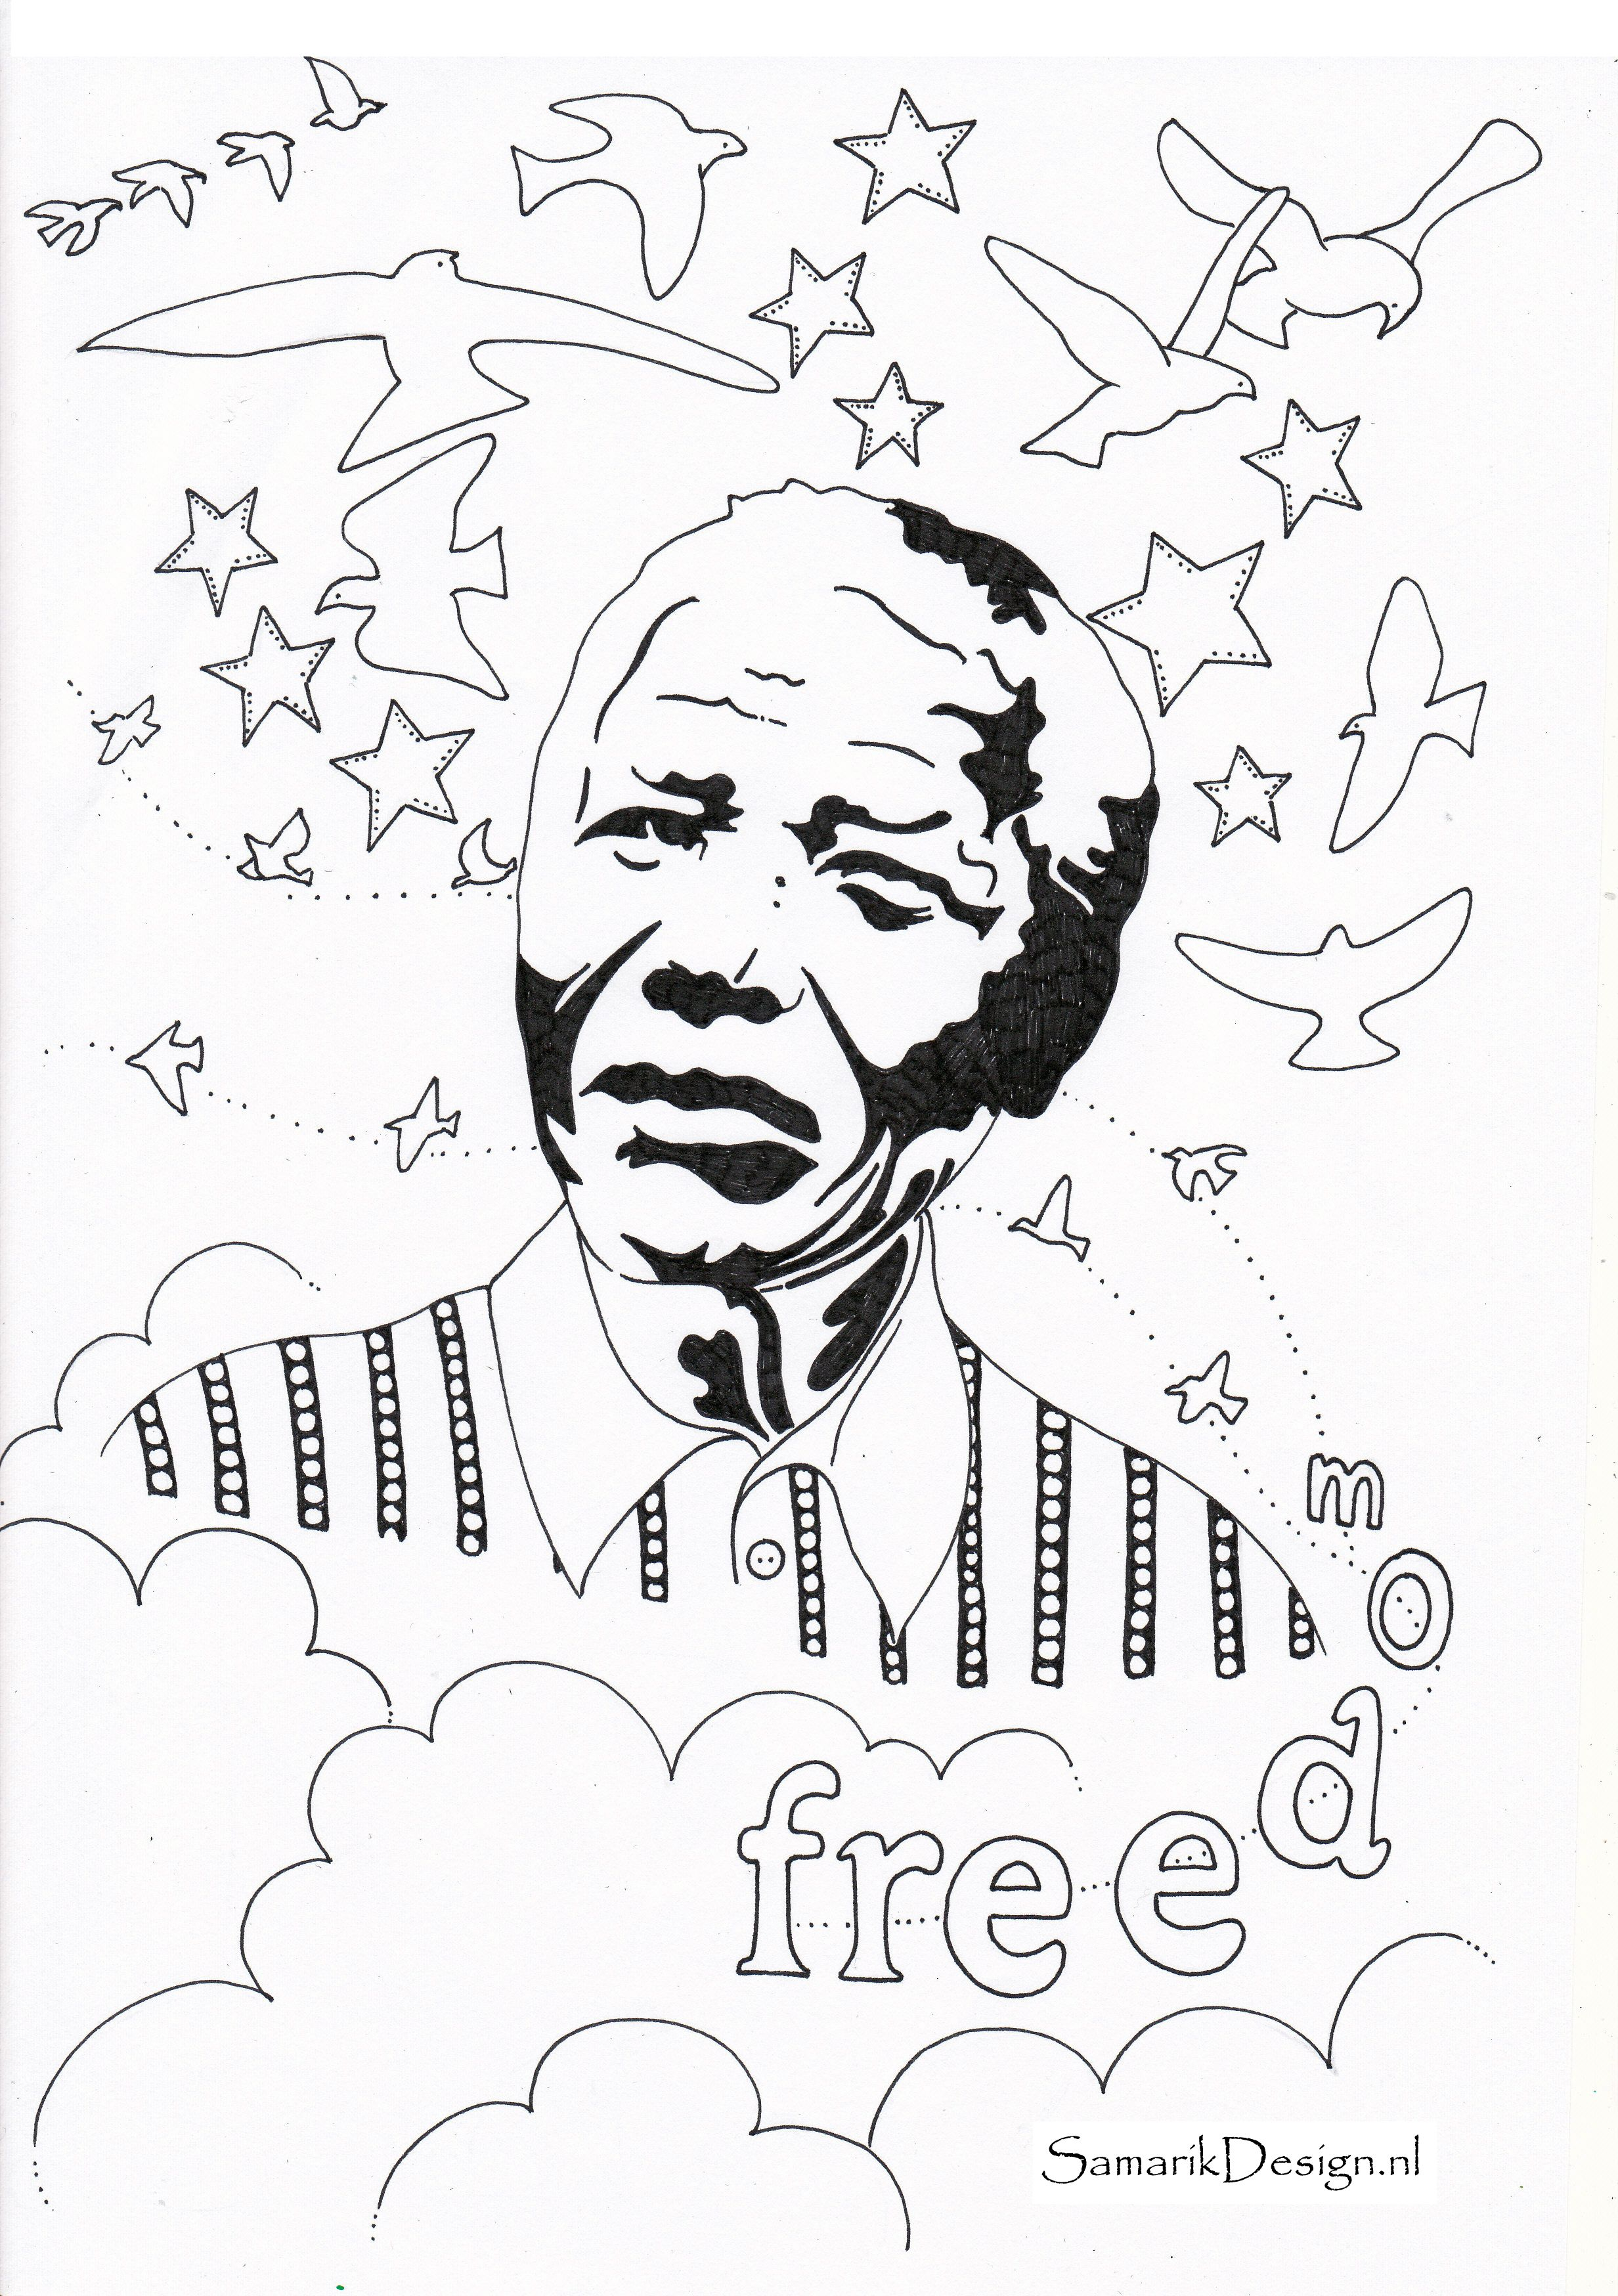 Nelson Mandela Famous People Black History Month Crafts Nelson Mandela Art Enchanted Forest Coloring Book